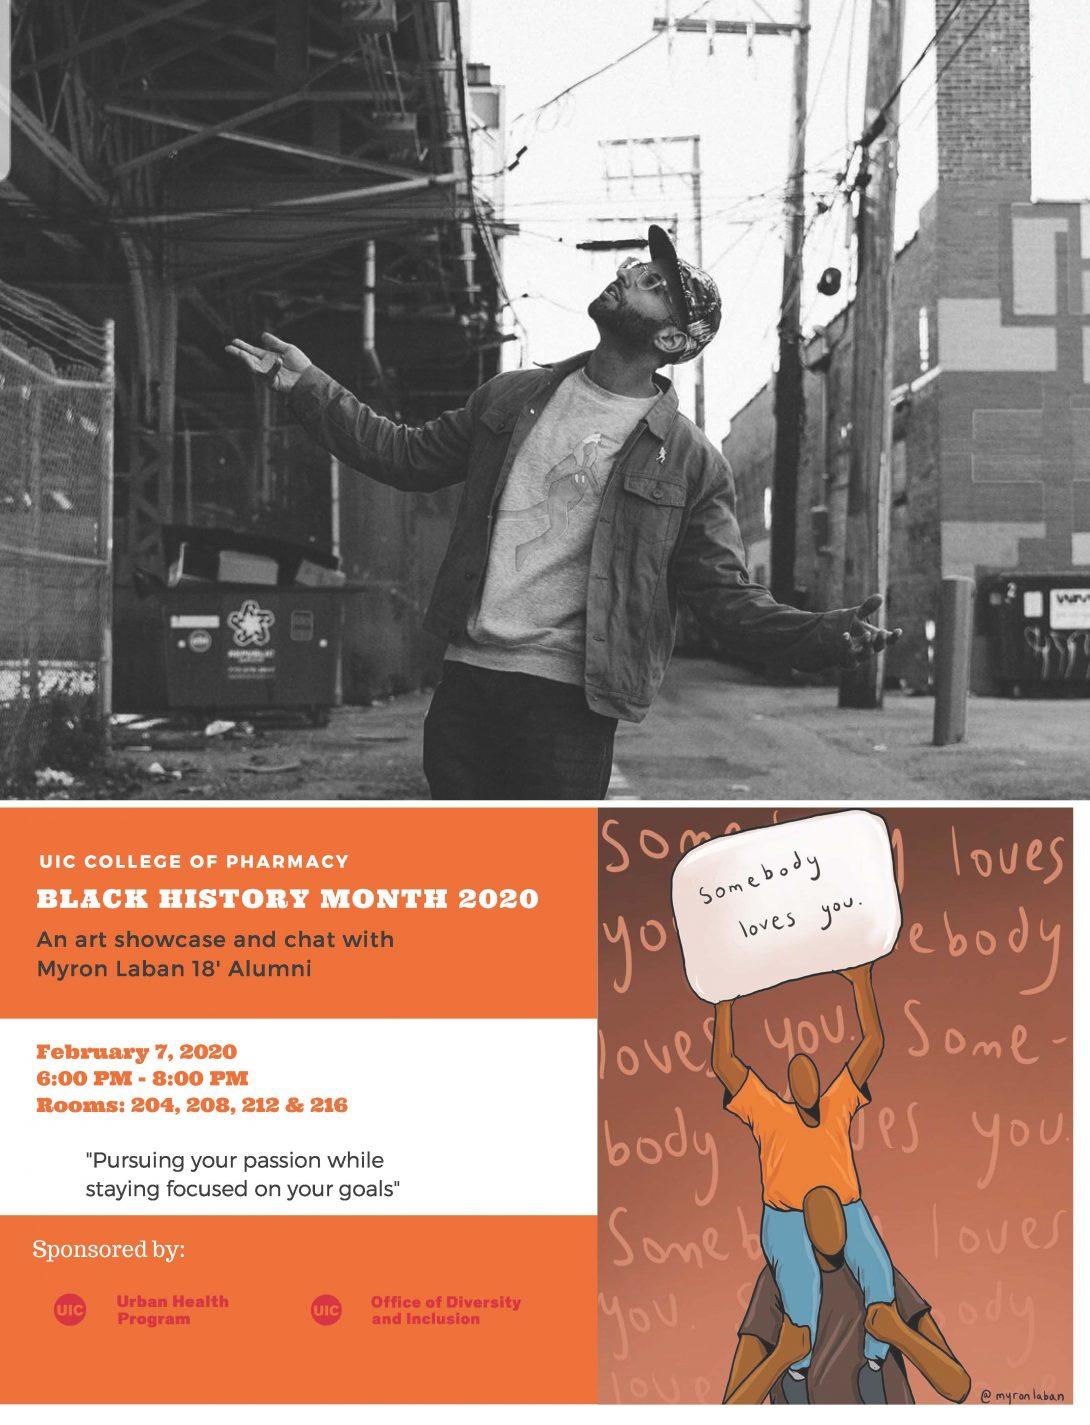 UIC COP Black History Month 2020 art showcase flyer